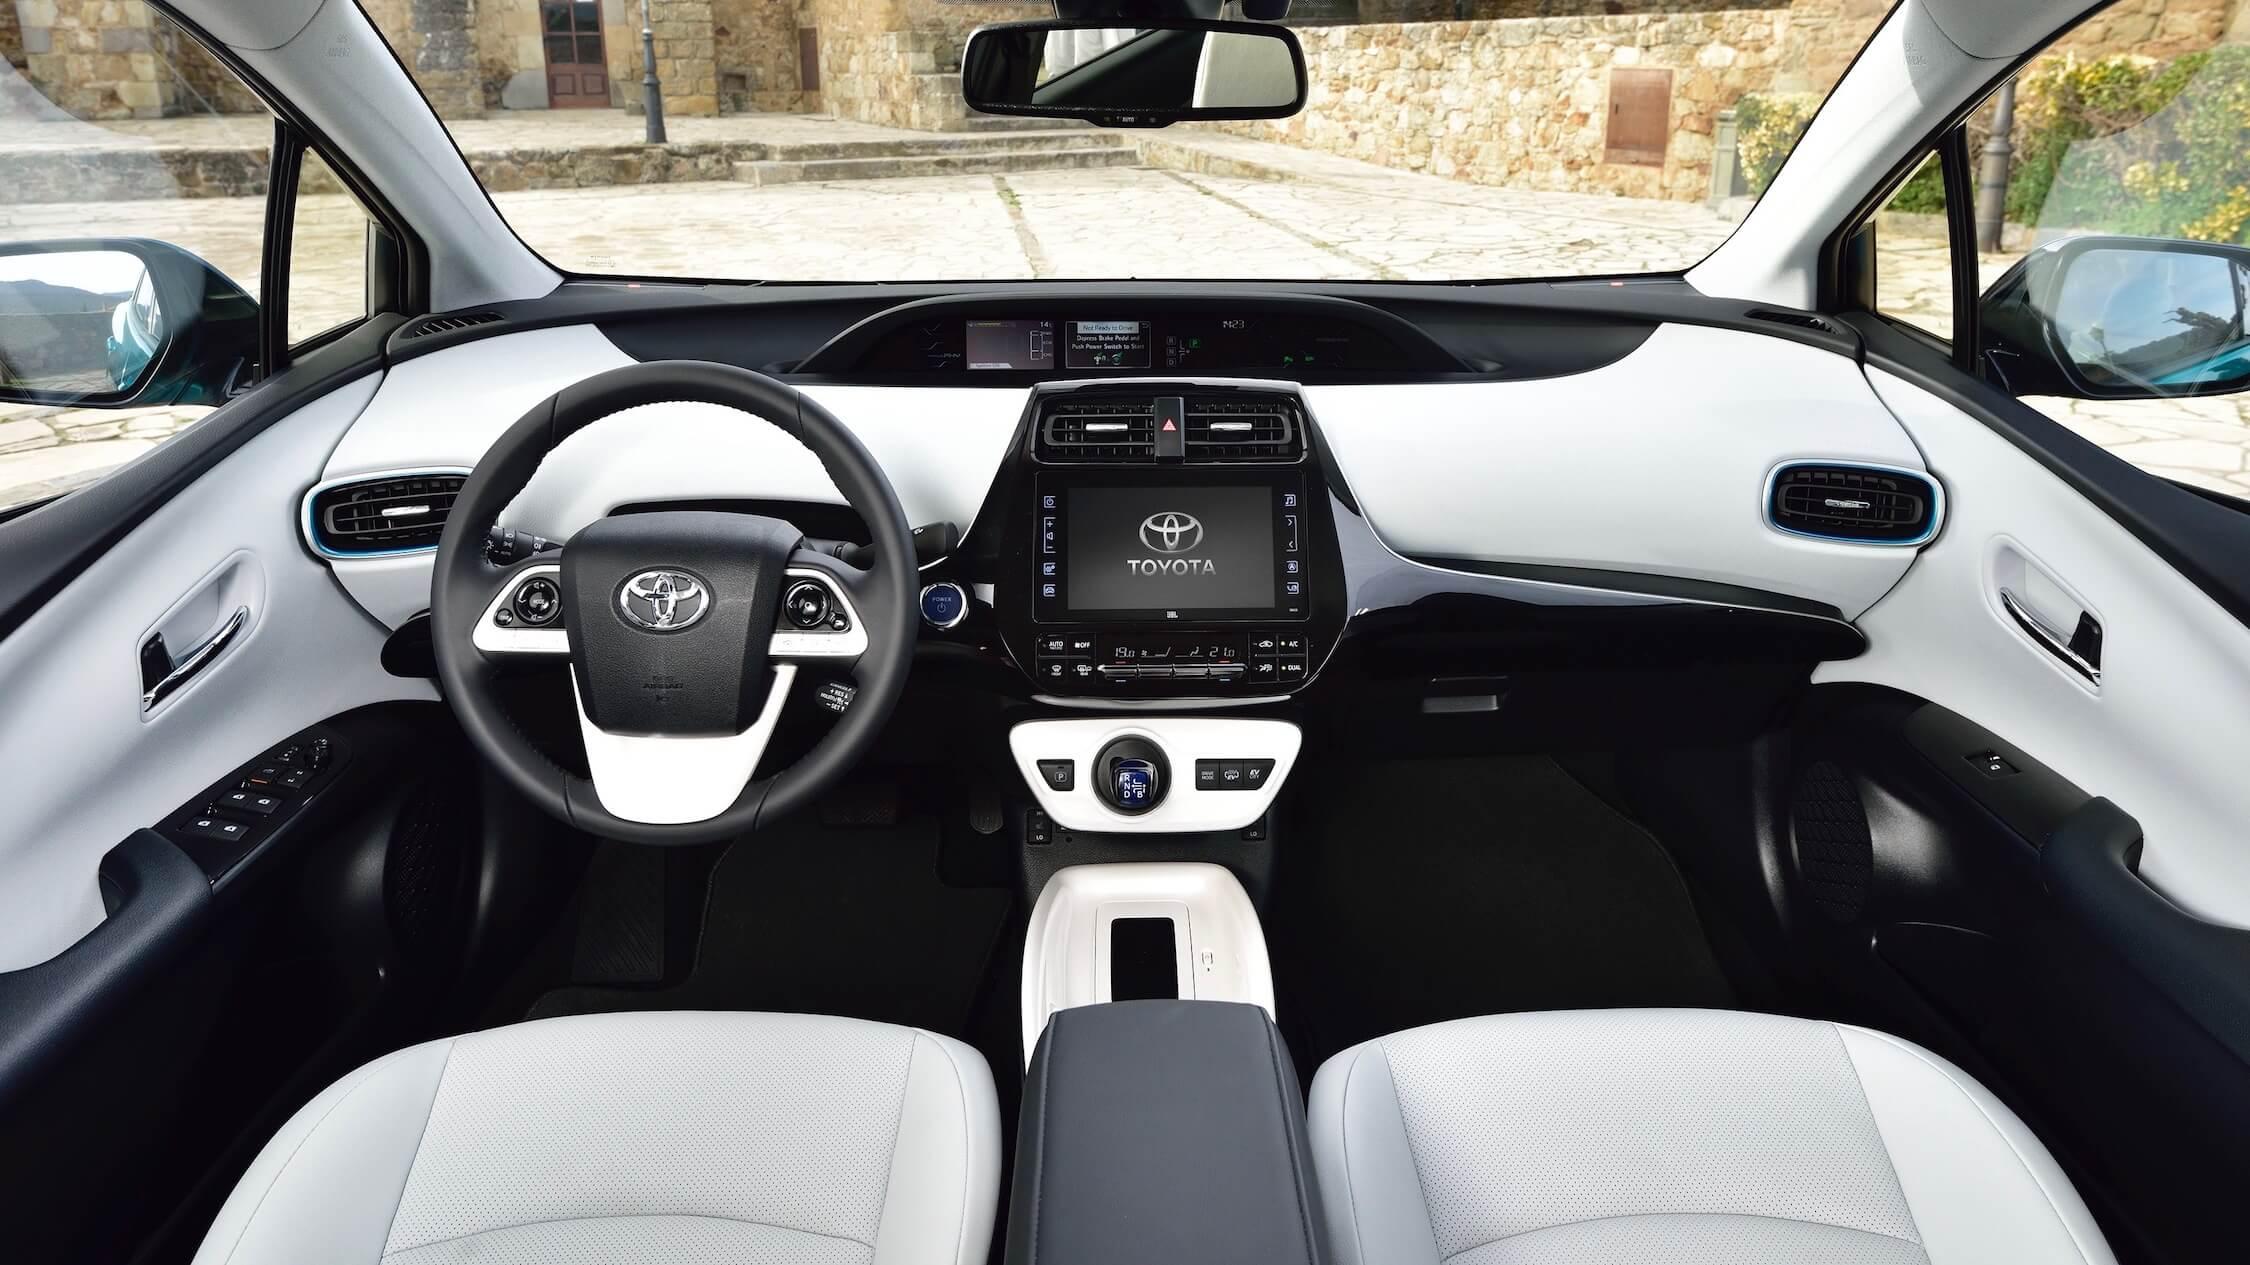 Toyota Prius híbrido plug-in interior